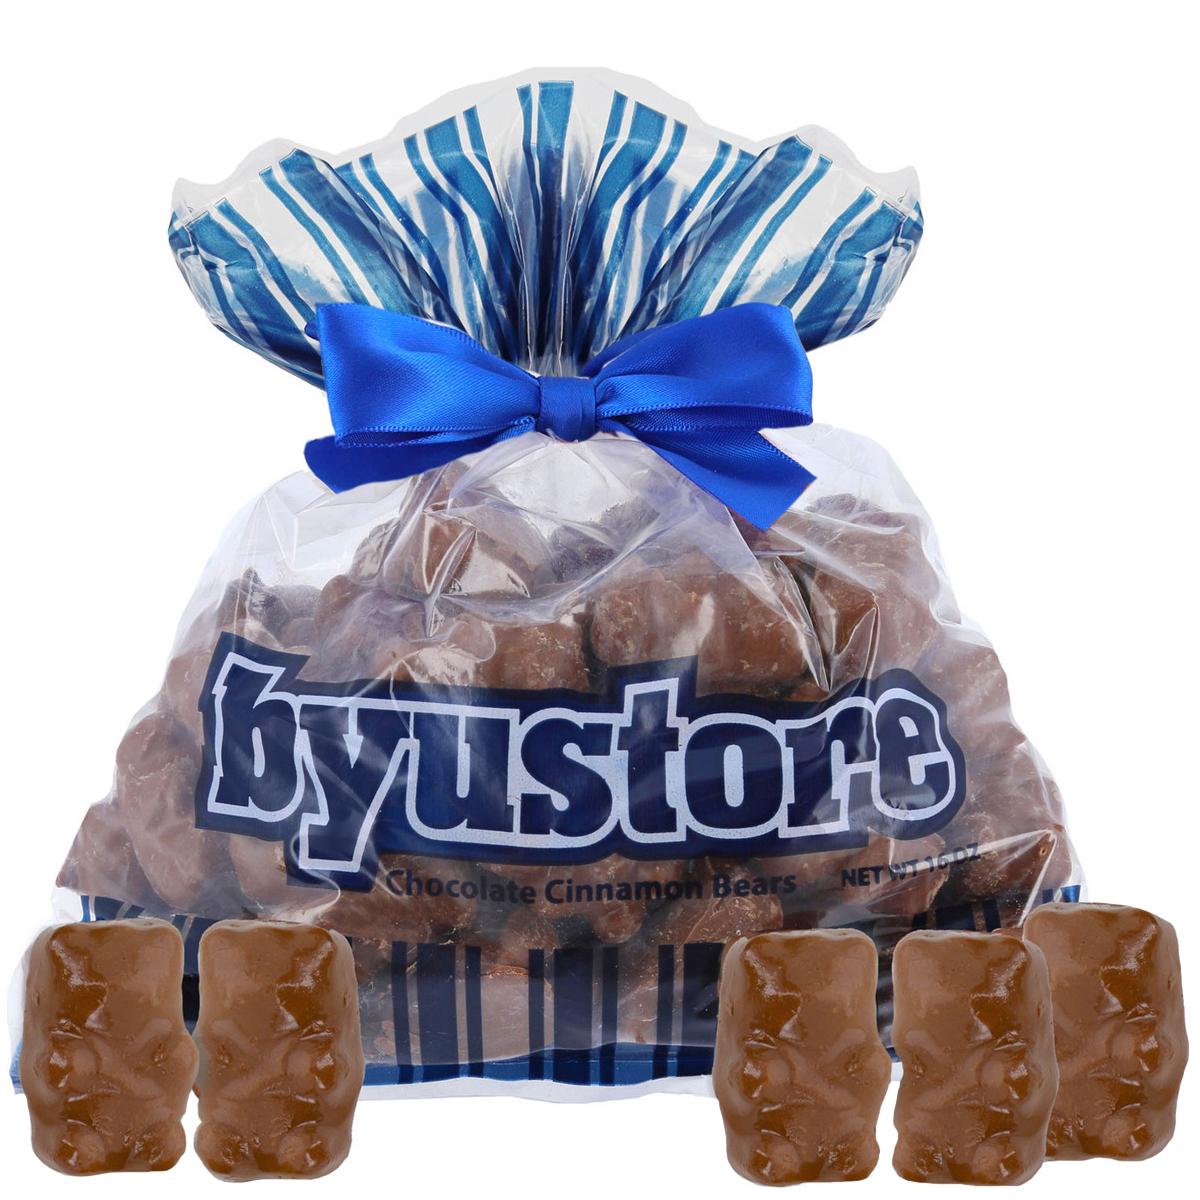 BYU Store Chocolate Covered Cinnamon Bears - 1 lb. Bag